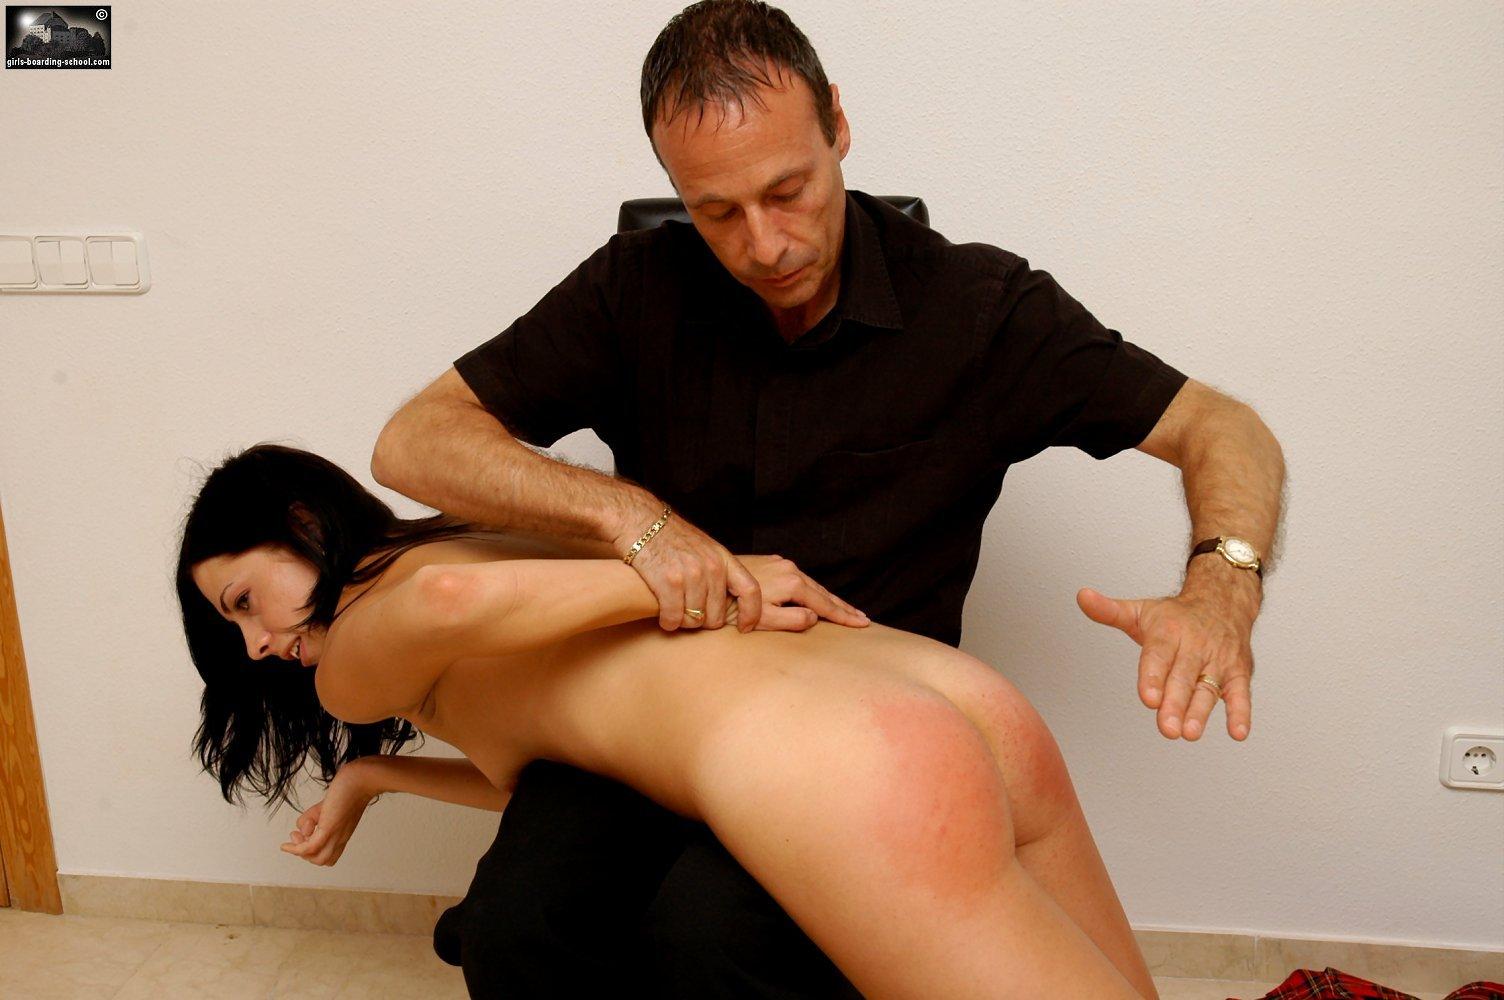 Dad spanking boy 3d gallery gay an orgy of 2